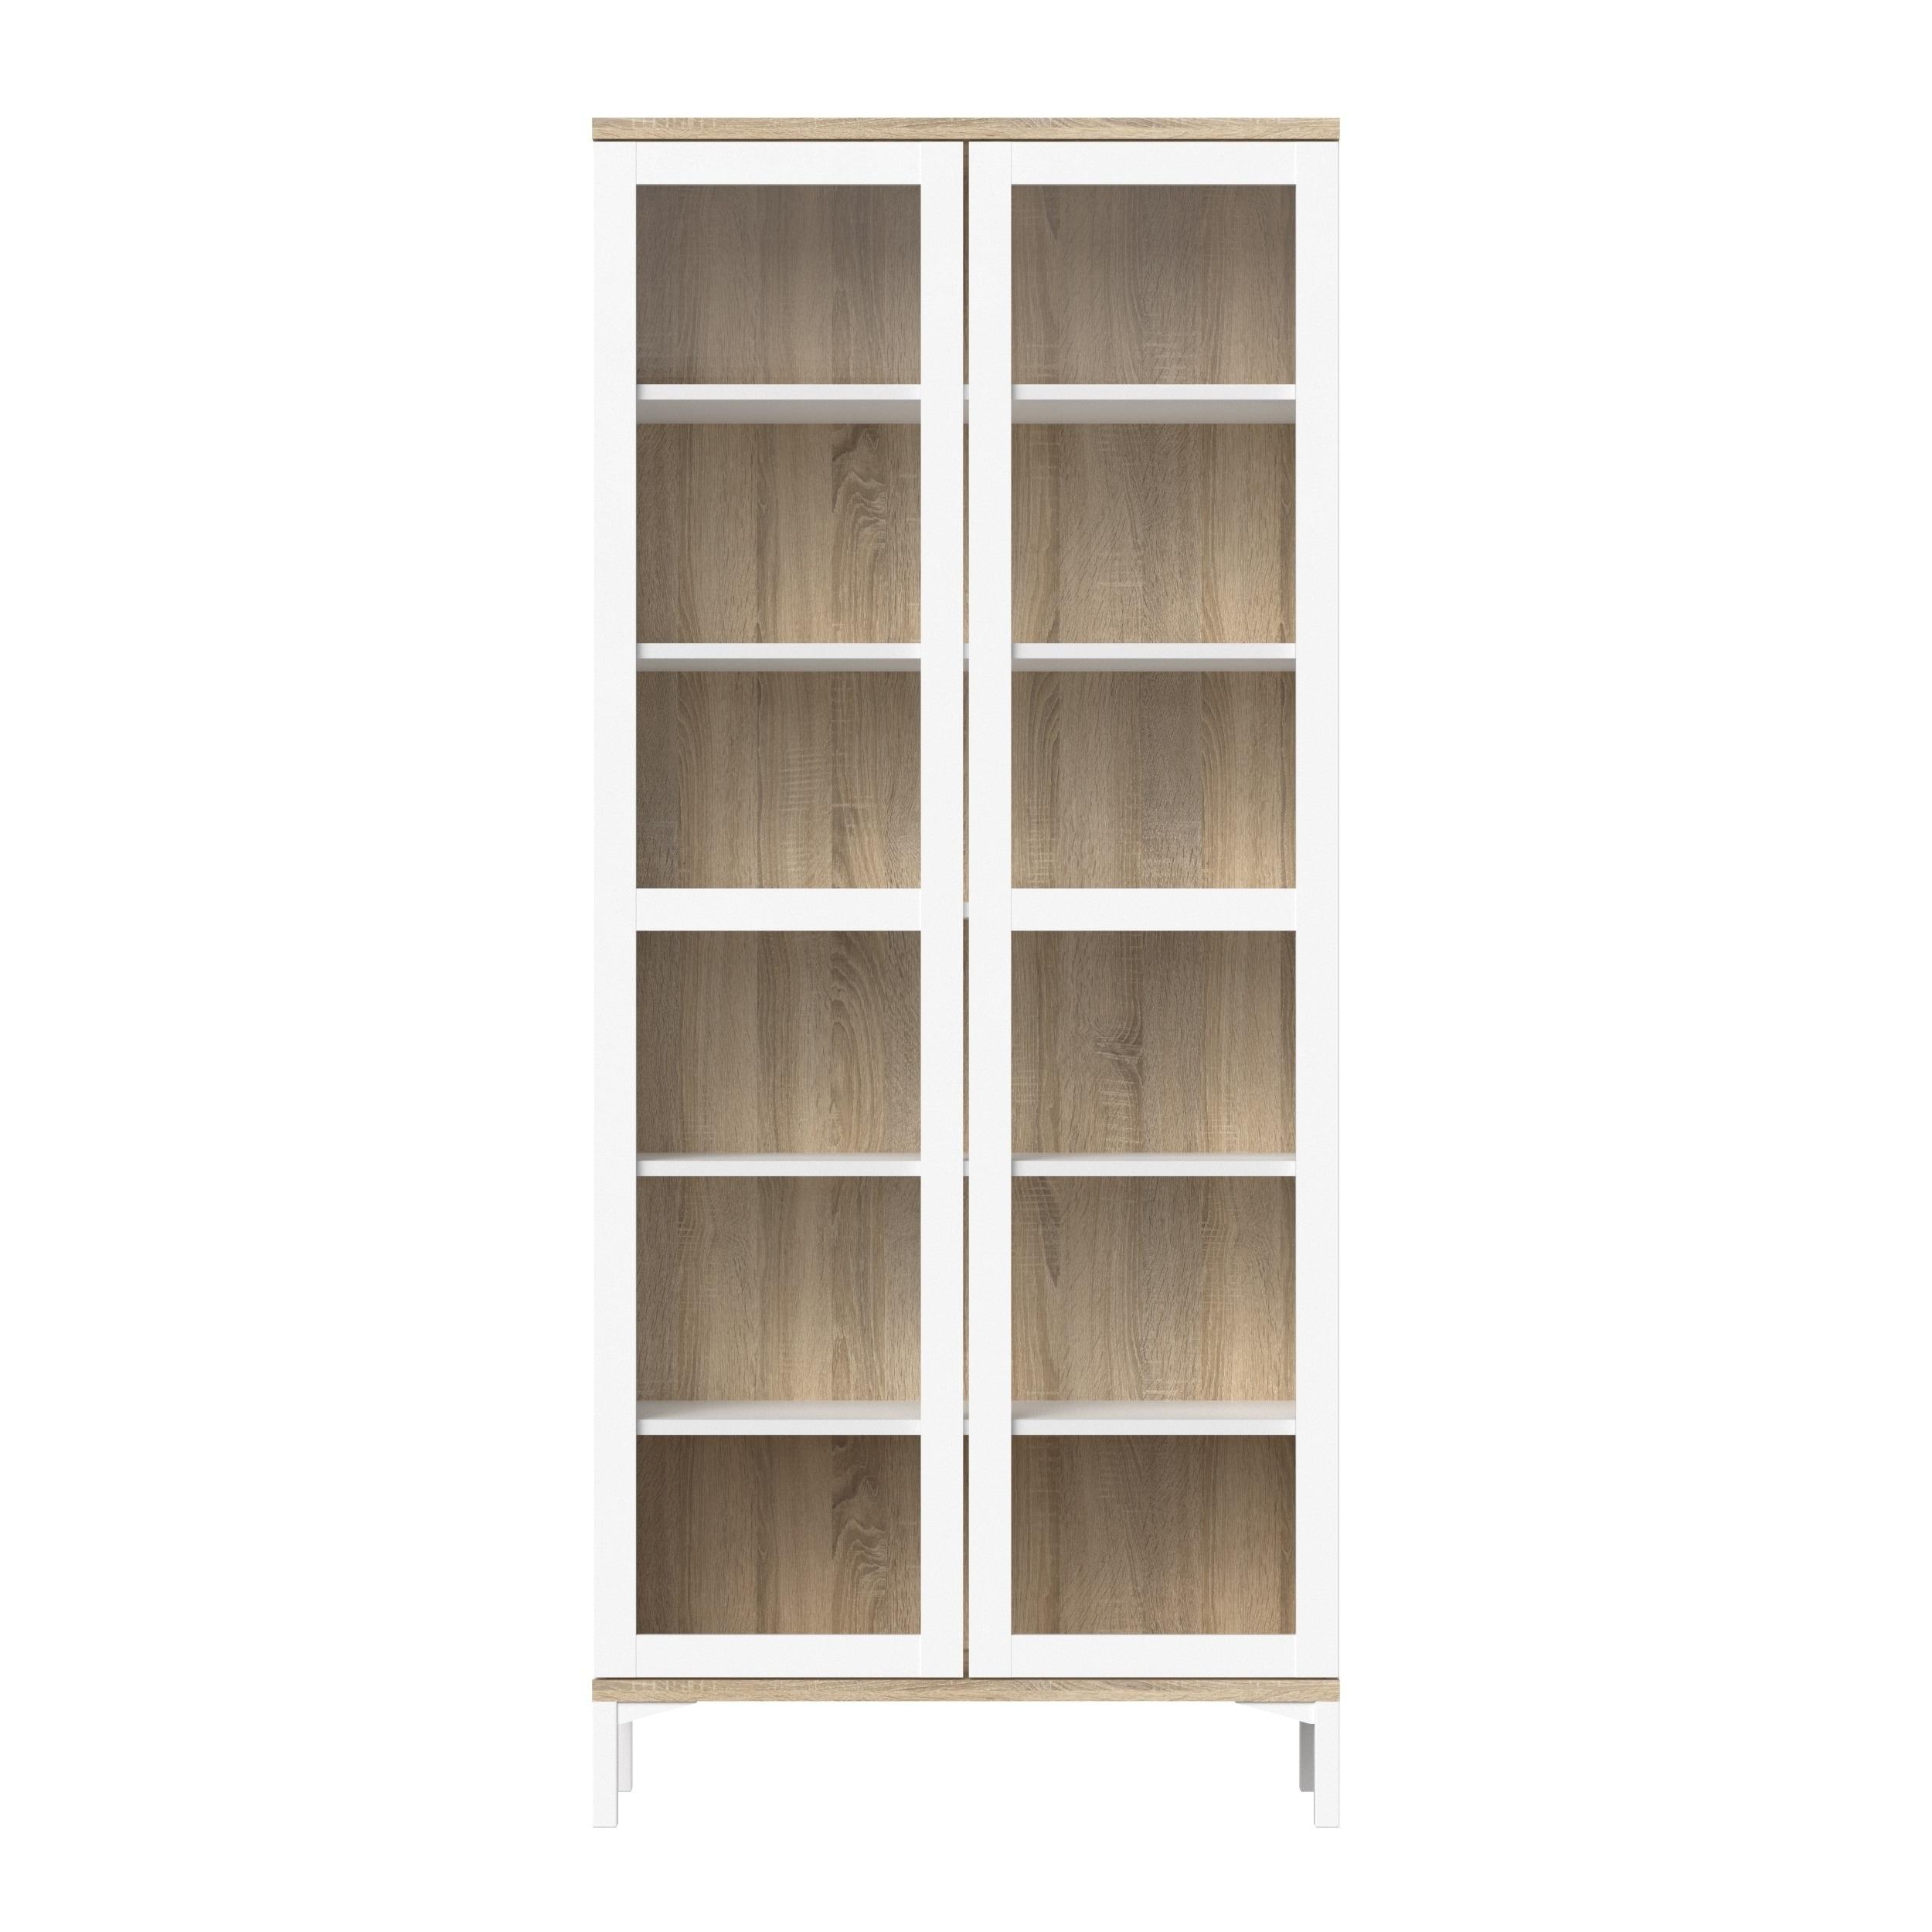 deco china breakfronts oak furniture art american modernism modernage cabinet case items